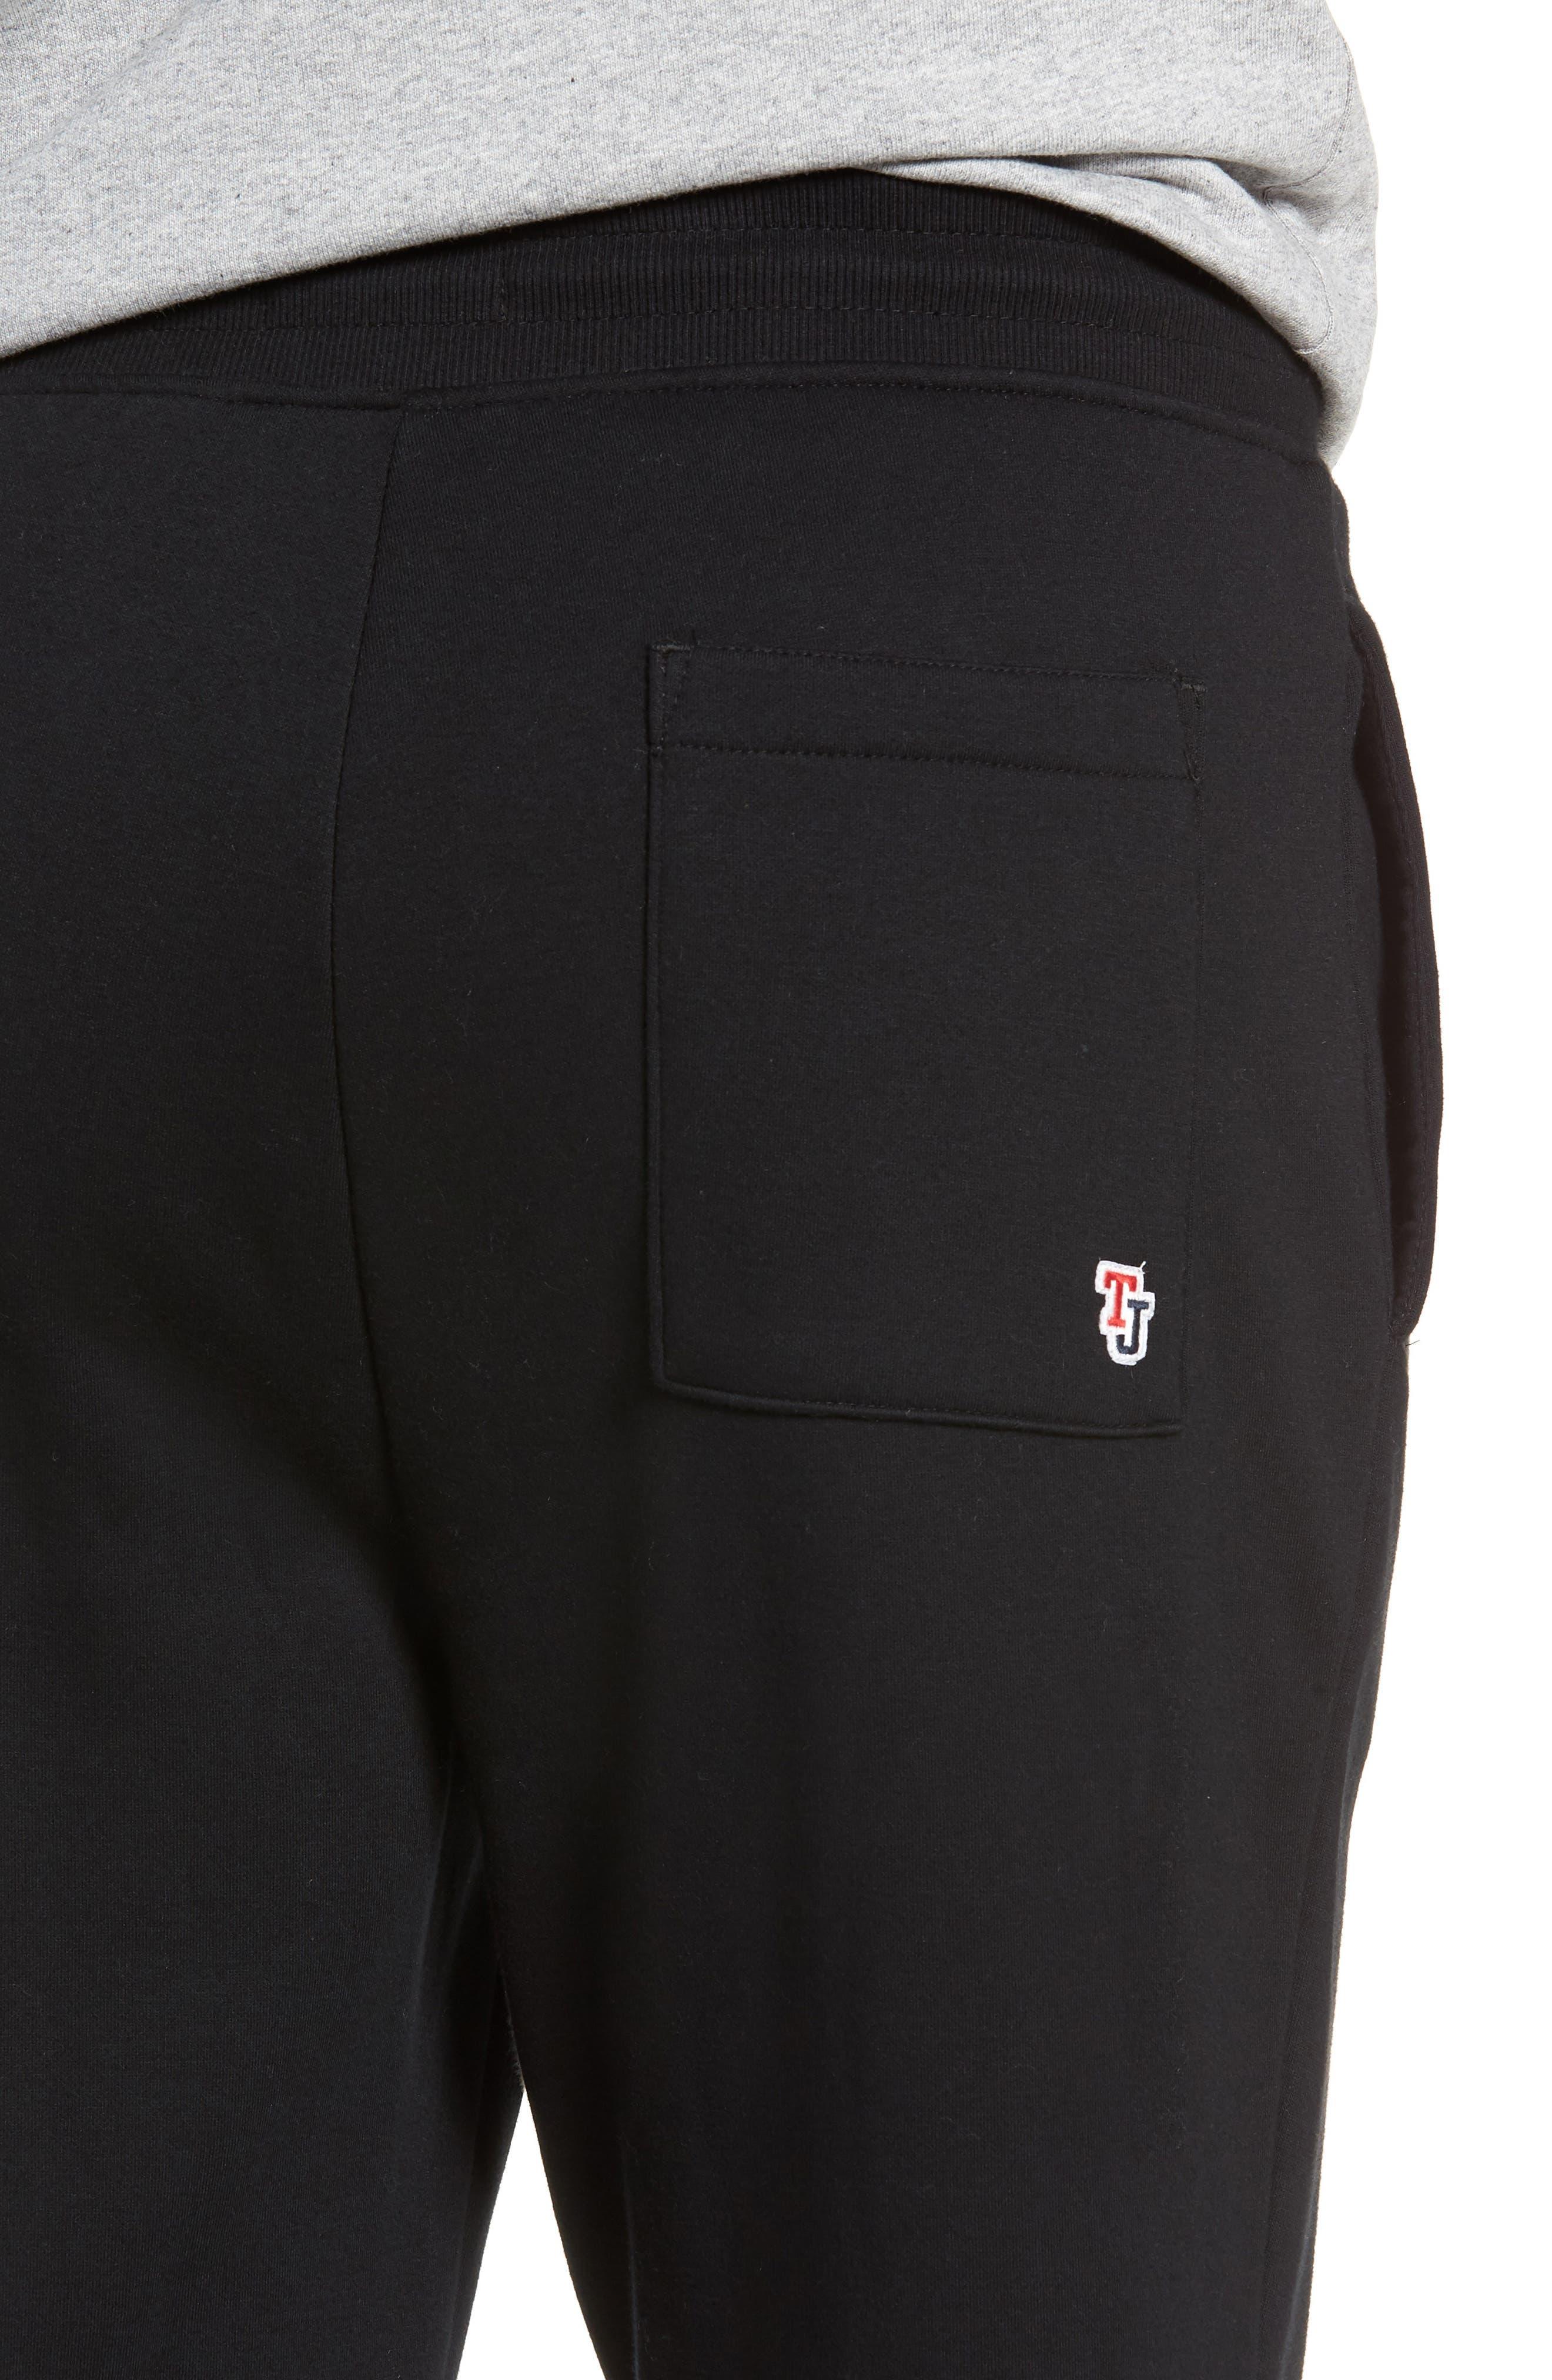 TJM Classics Sweatpants,                             Alternate thumbnail 4, color,                             TOMMY BLACK